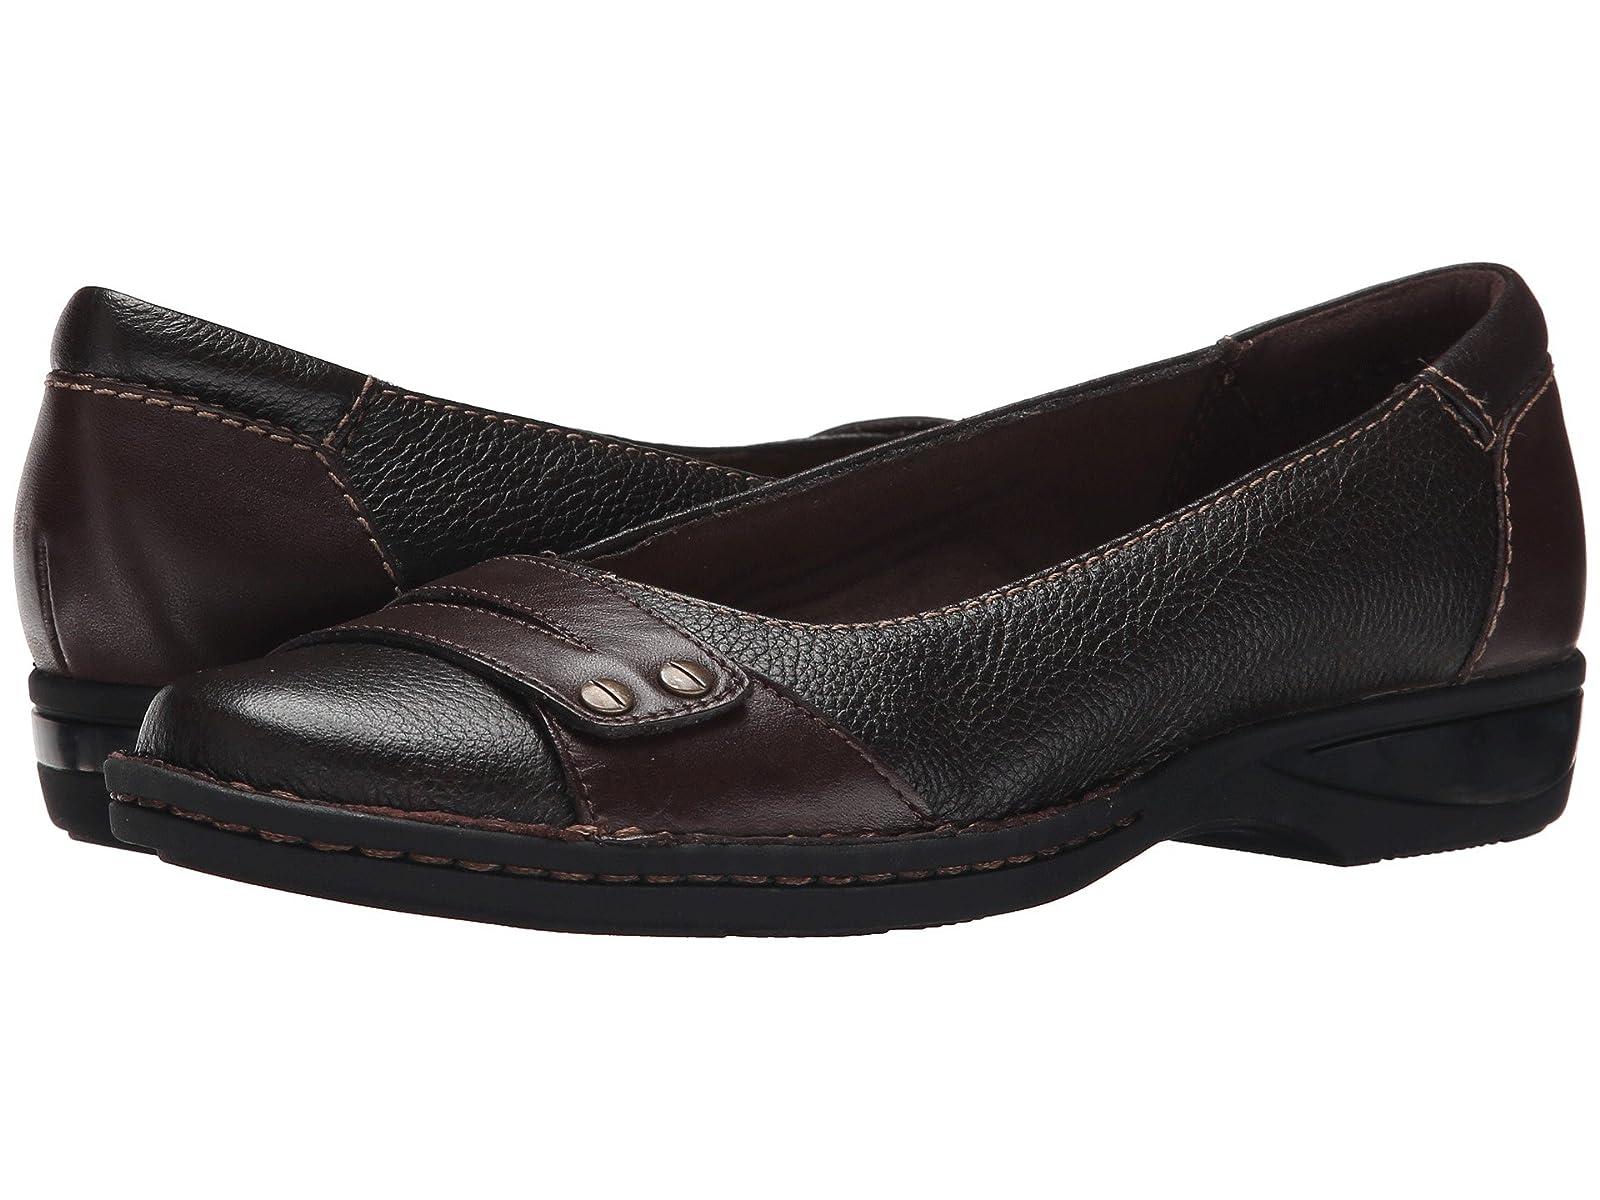 Clarks Pegg AbbieCheap and distinctive eye-catching shoes